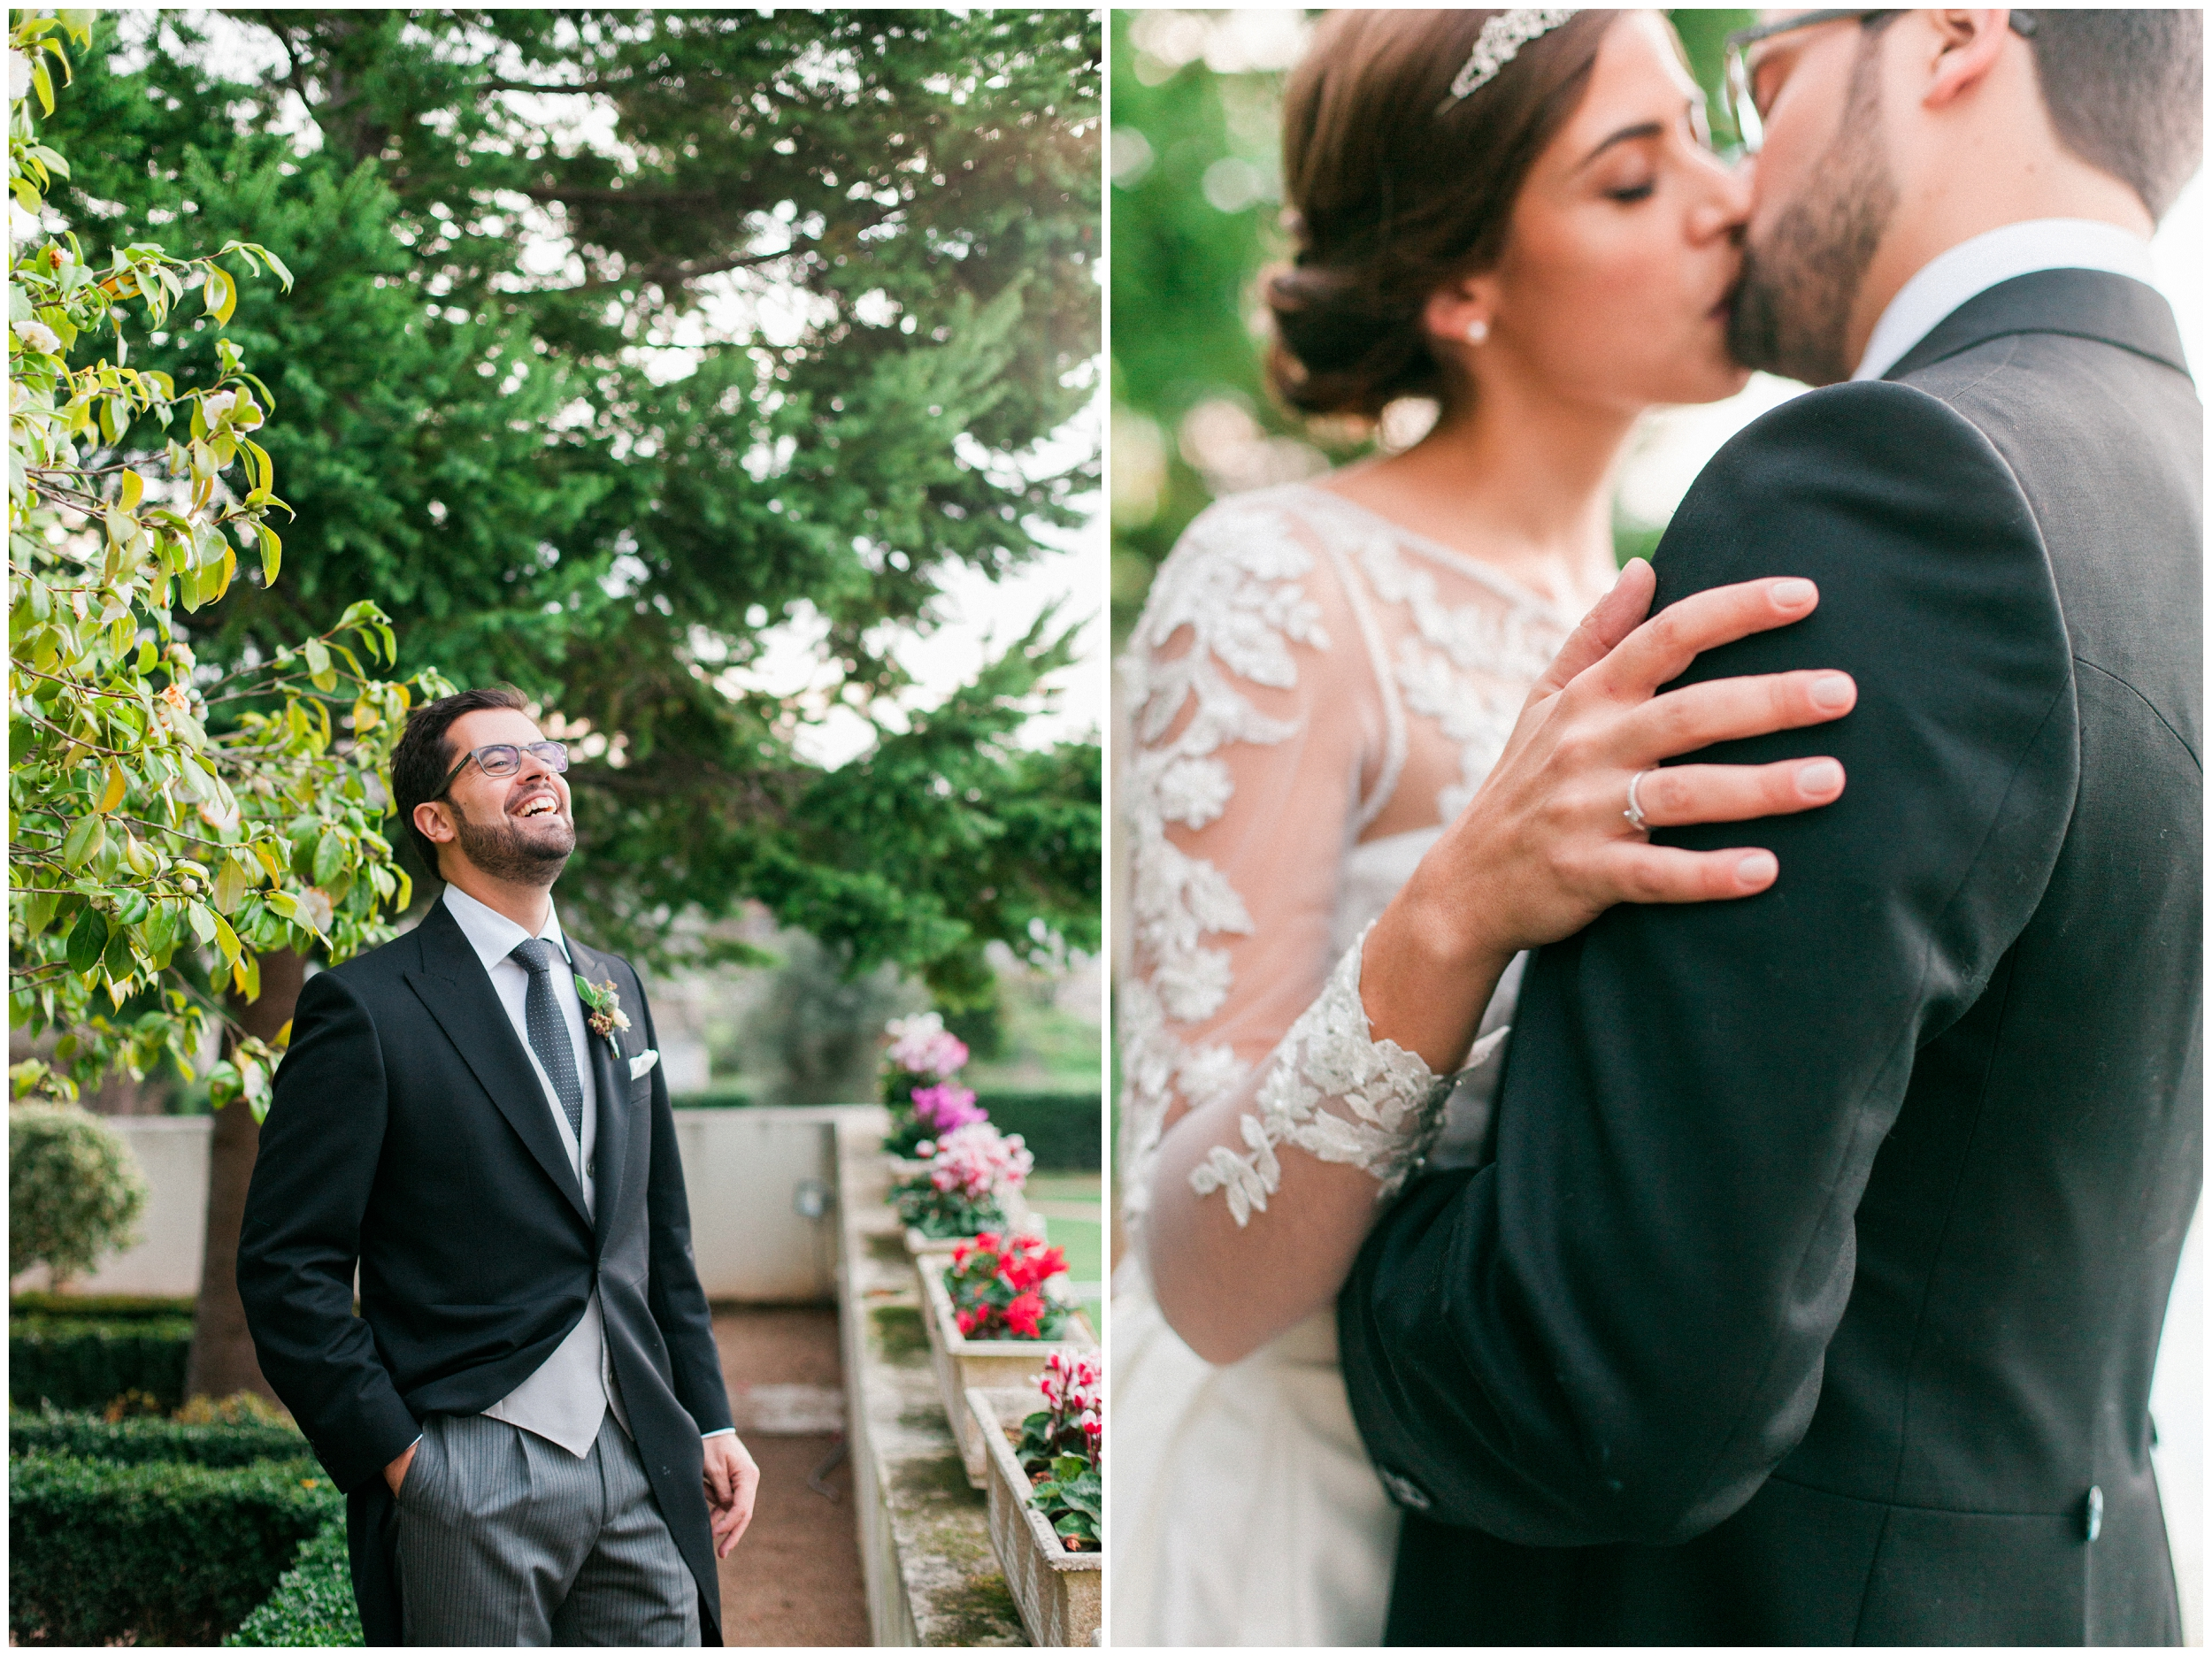 maria+rao+photography+wedding+palacio+lousa_0011.jpg